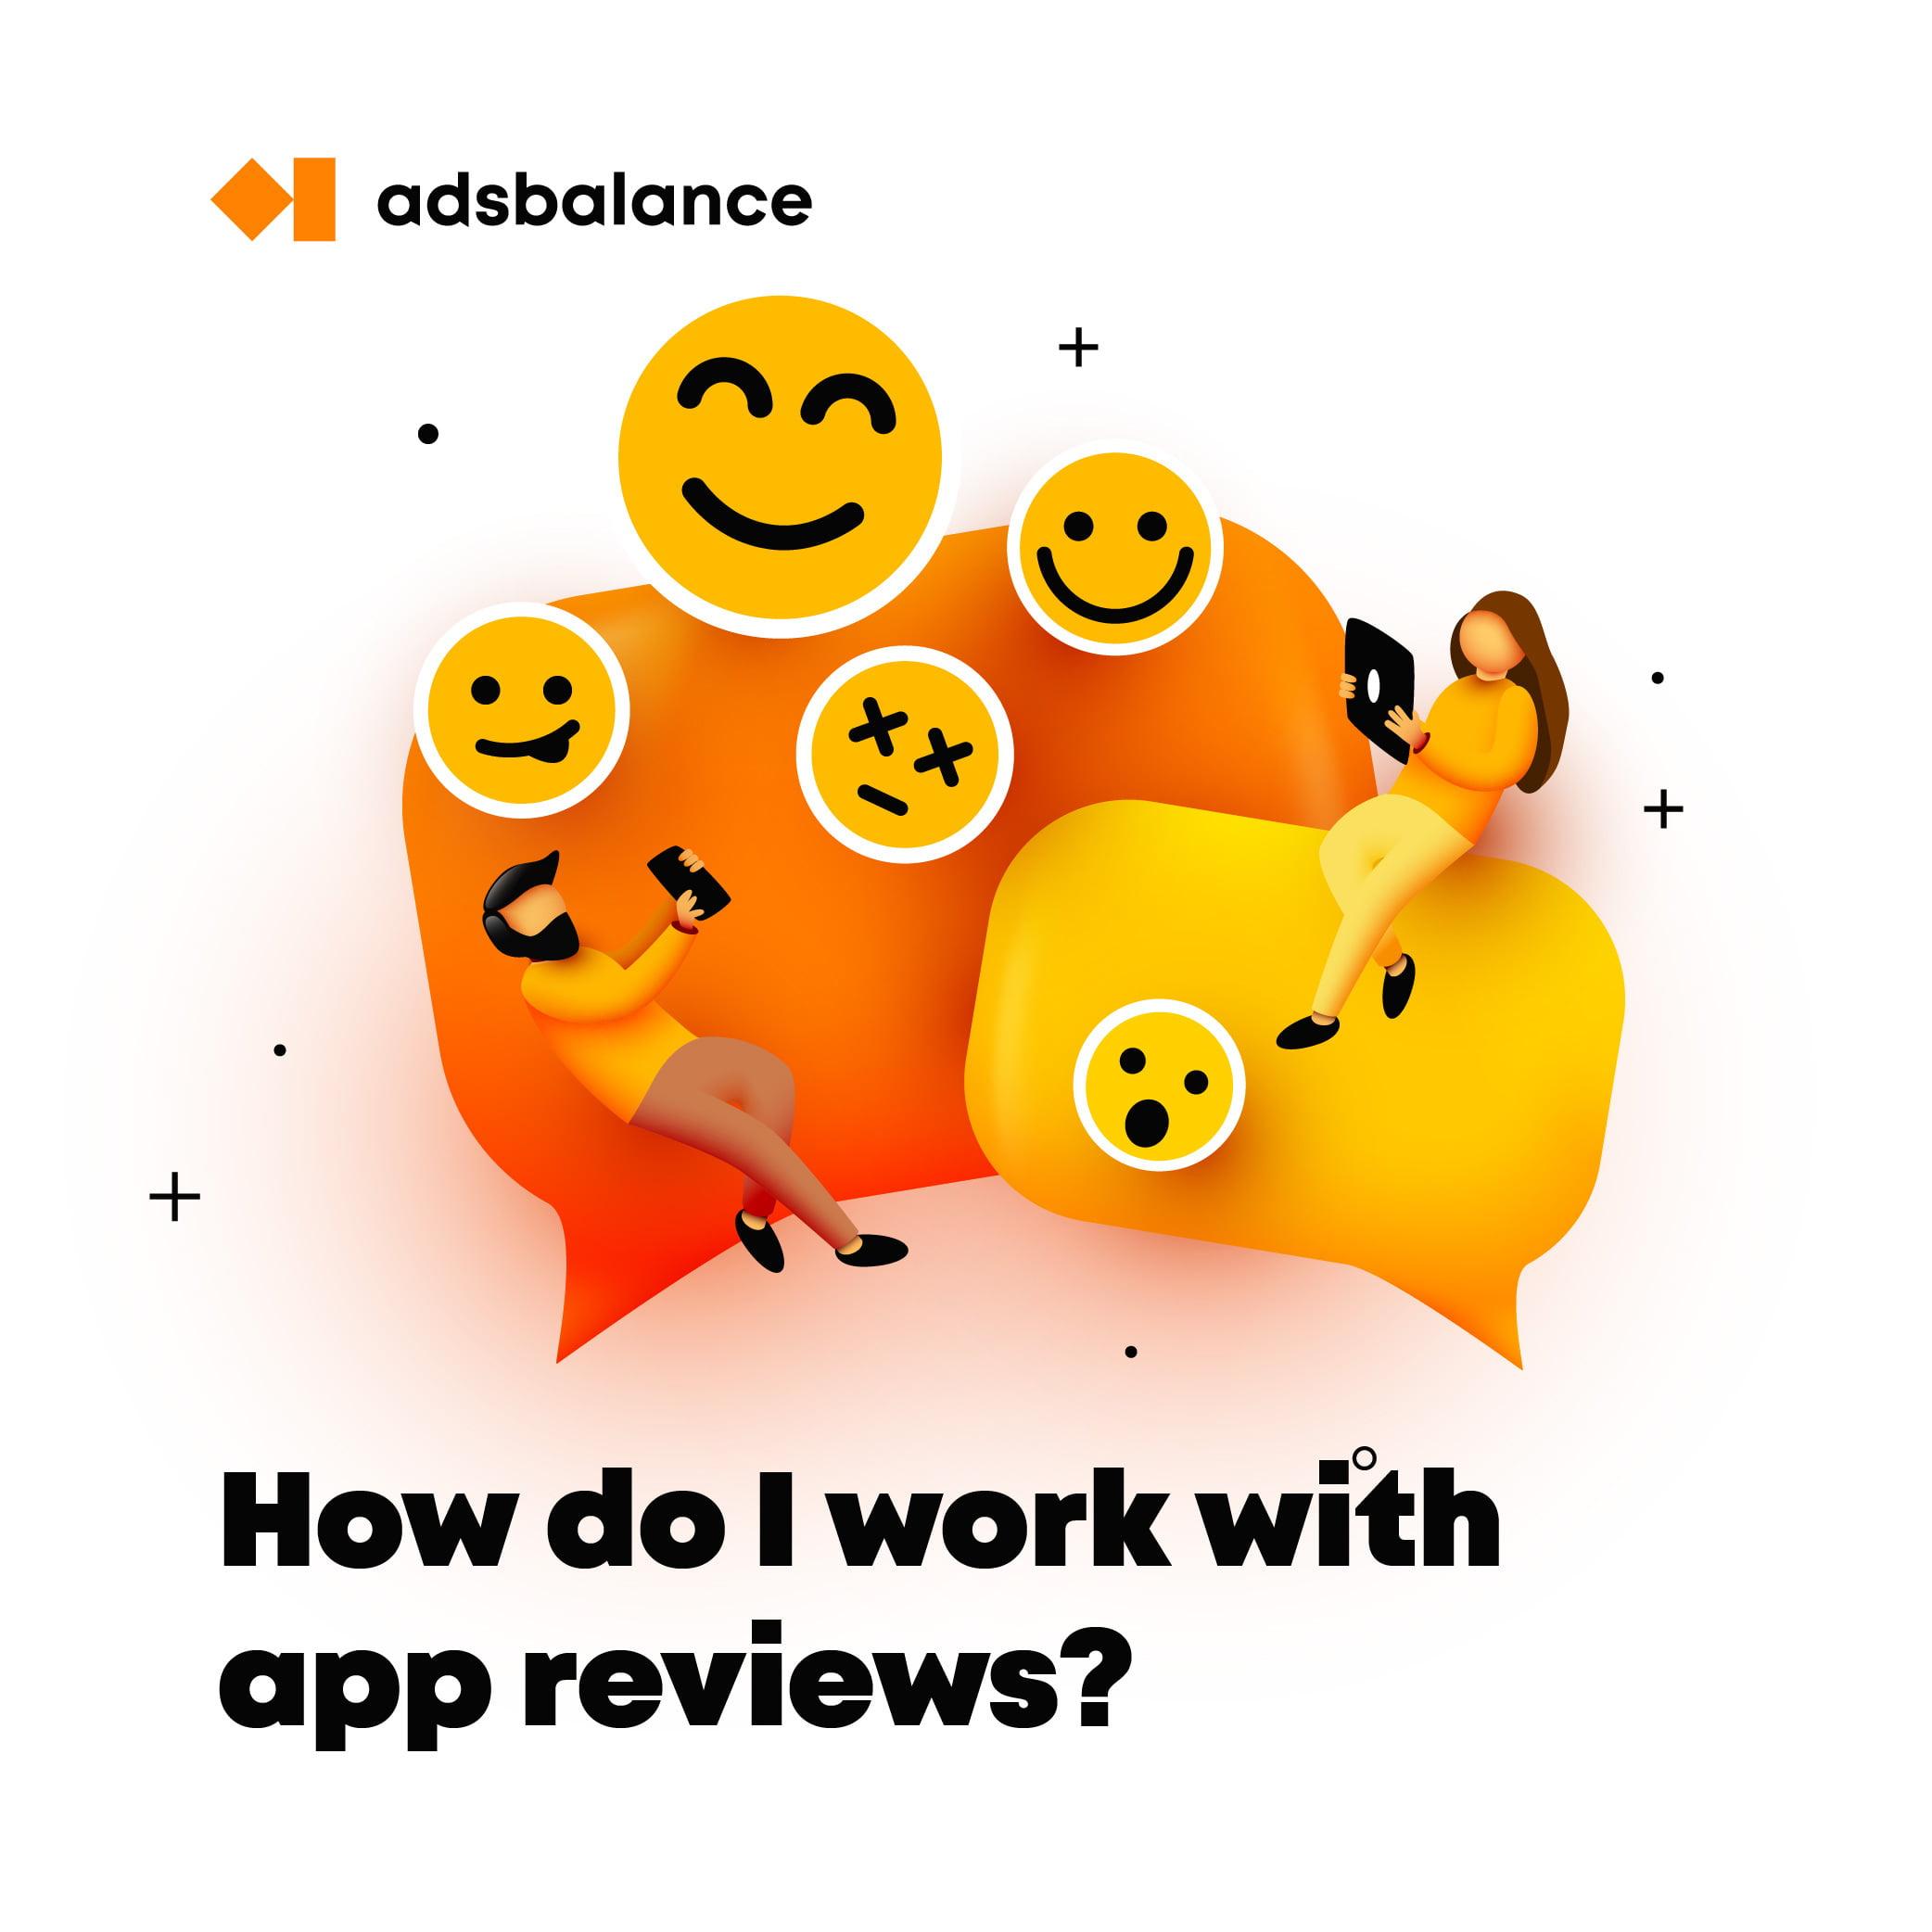 How do I work with app reviews?